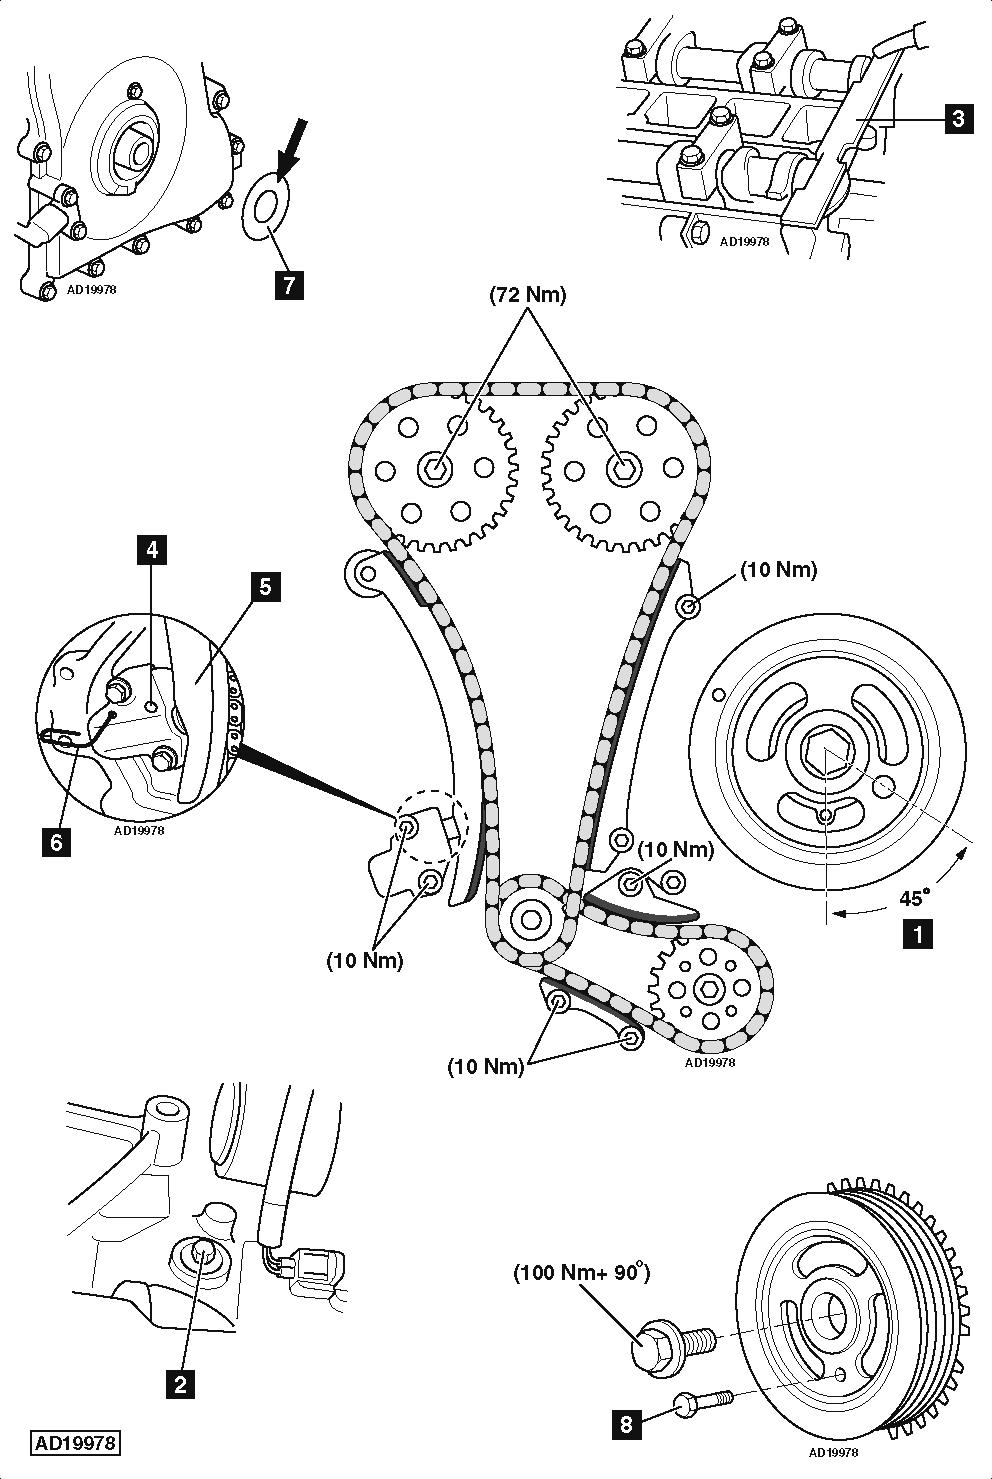 2008 volvo s40 Diagrama del motor